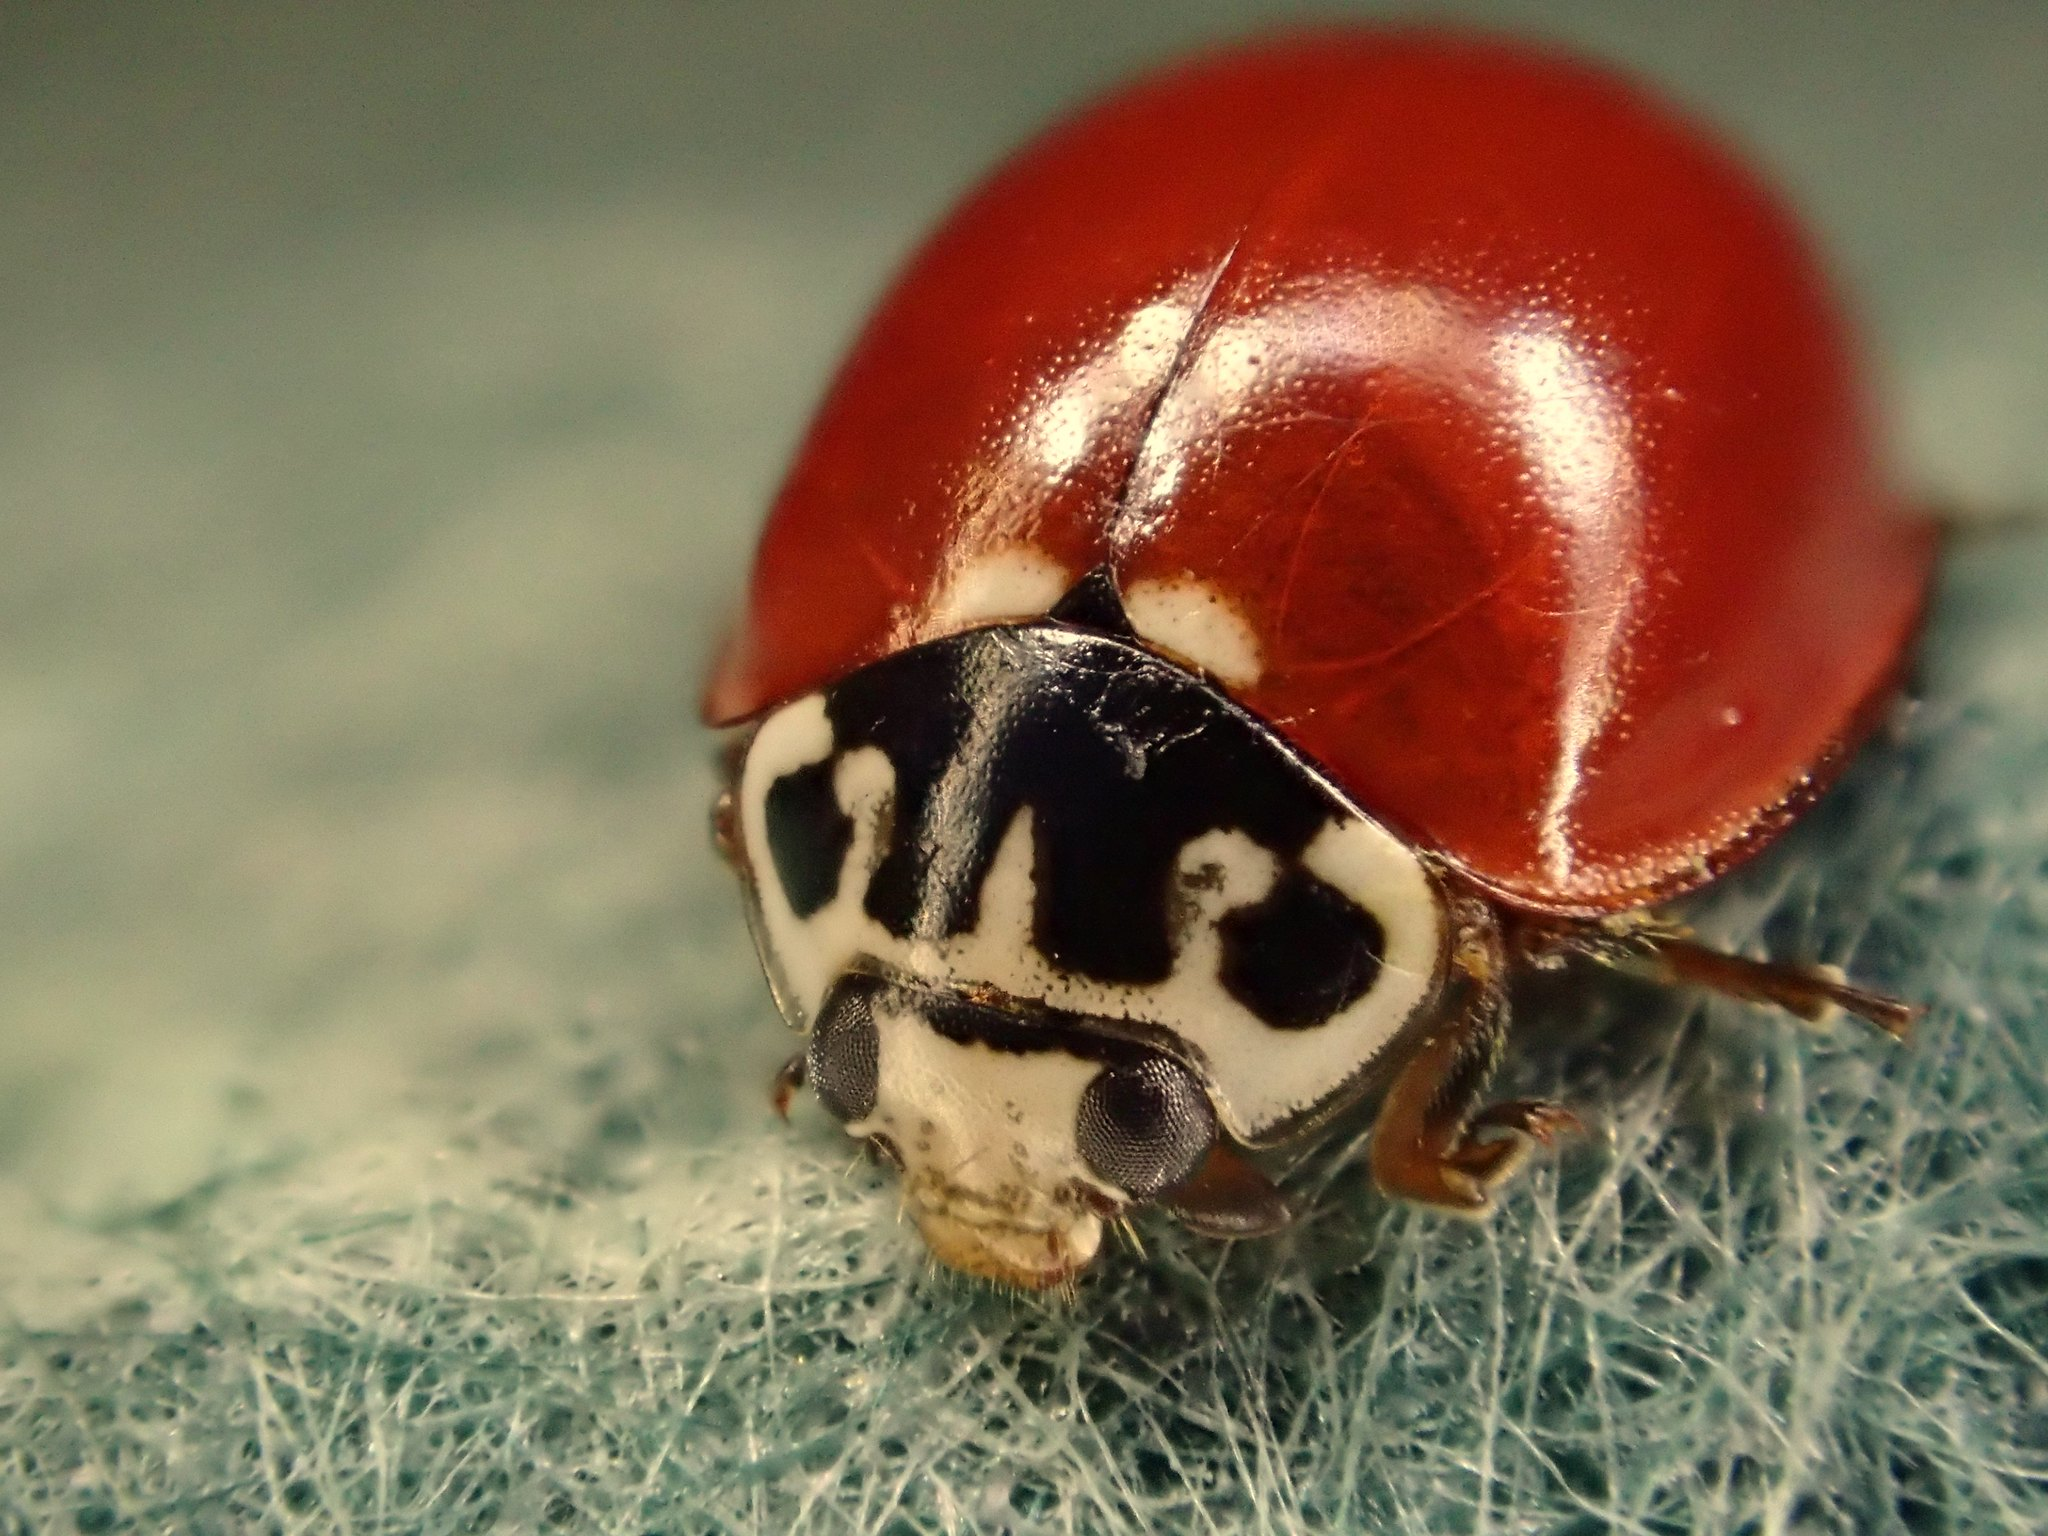 Western Blood-Red Lady Beetle or Ladybug Cycloneda polita #23